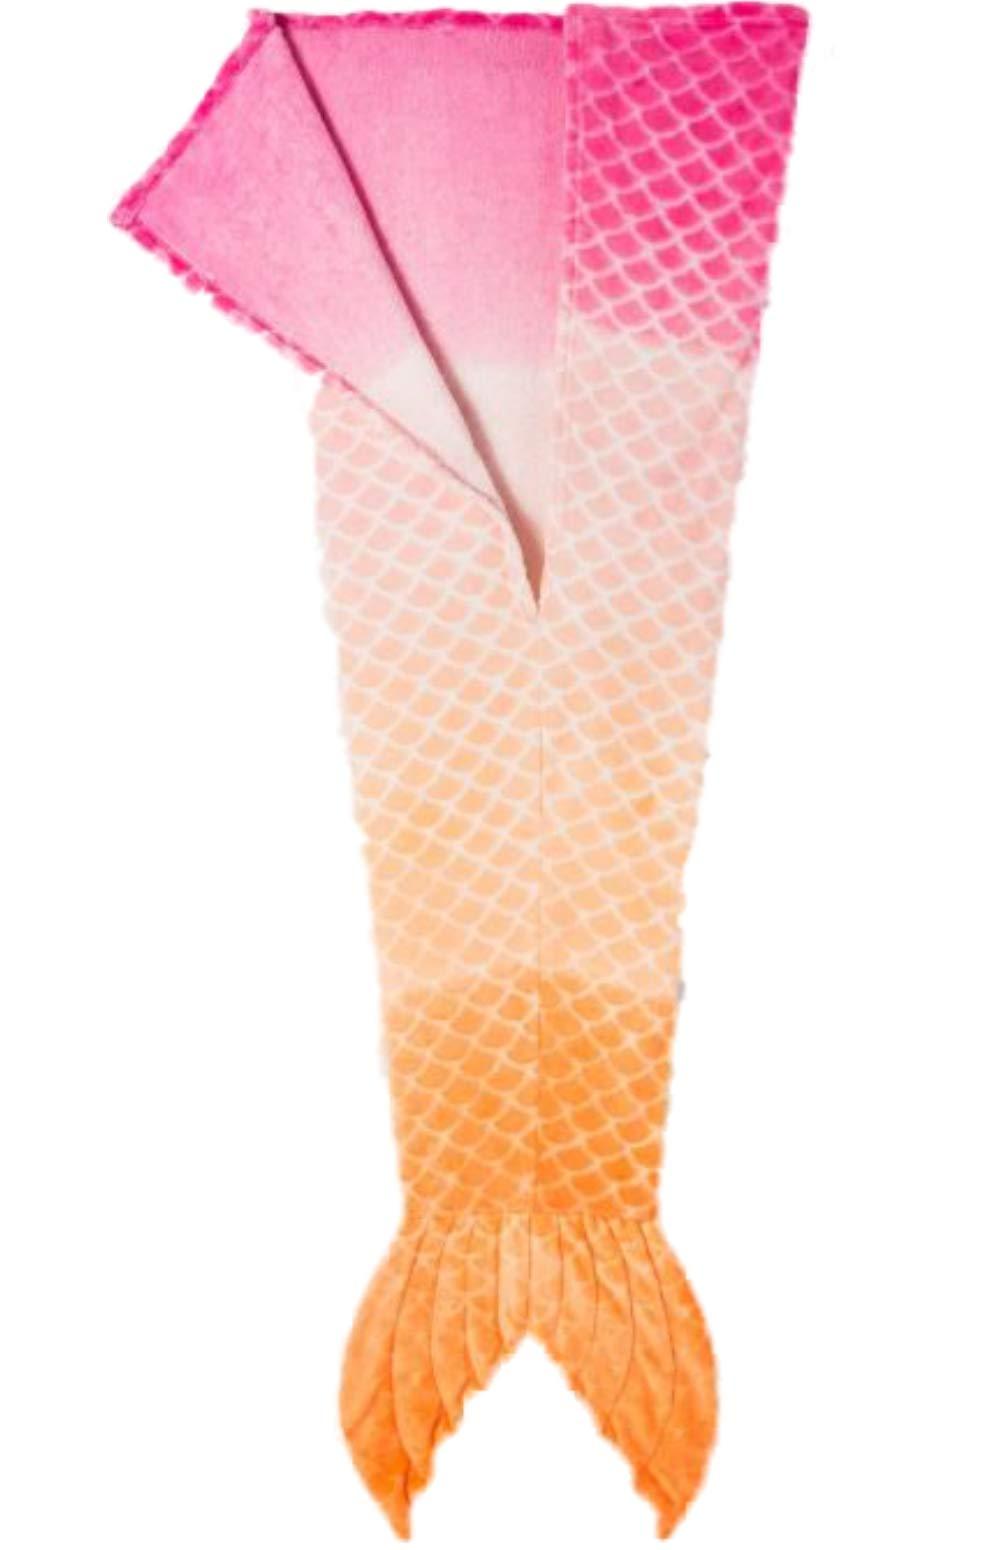 Pillowfort Pink Ombre Mermaid Tail Blanket